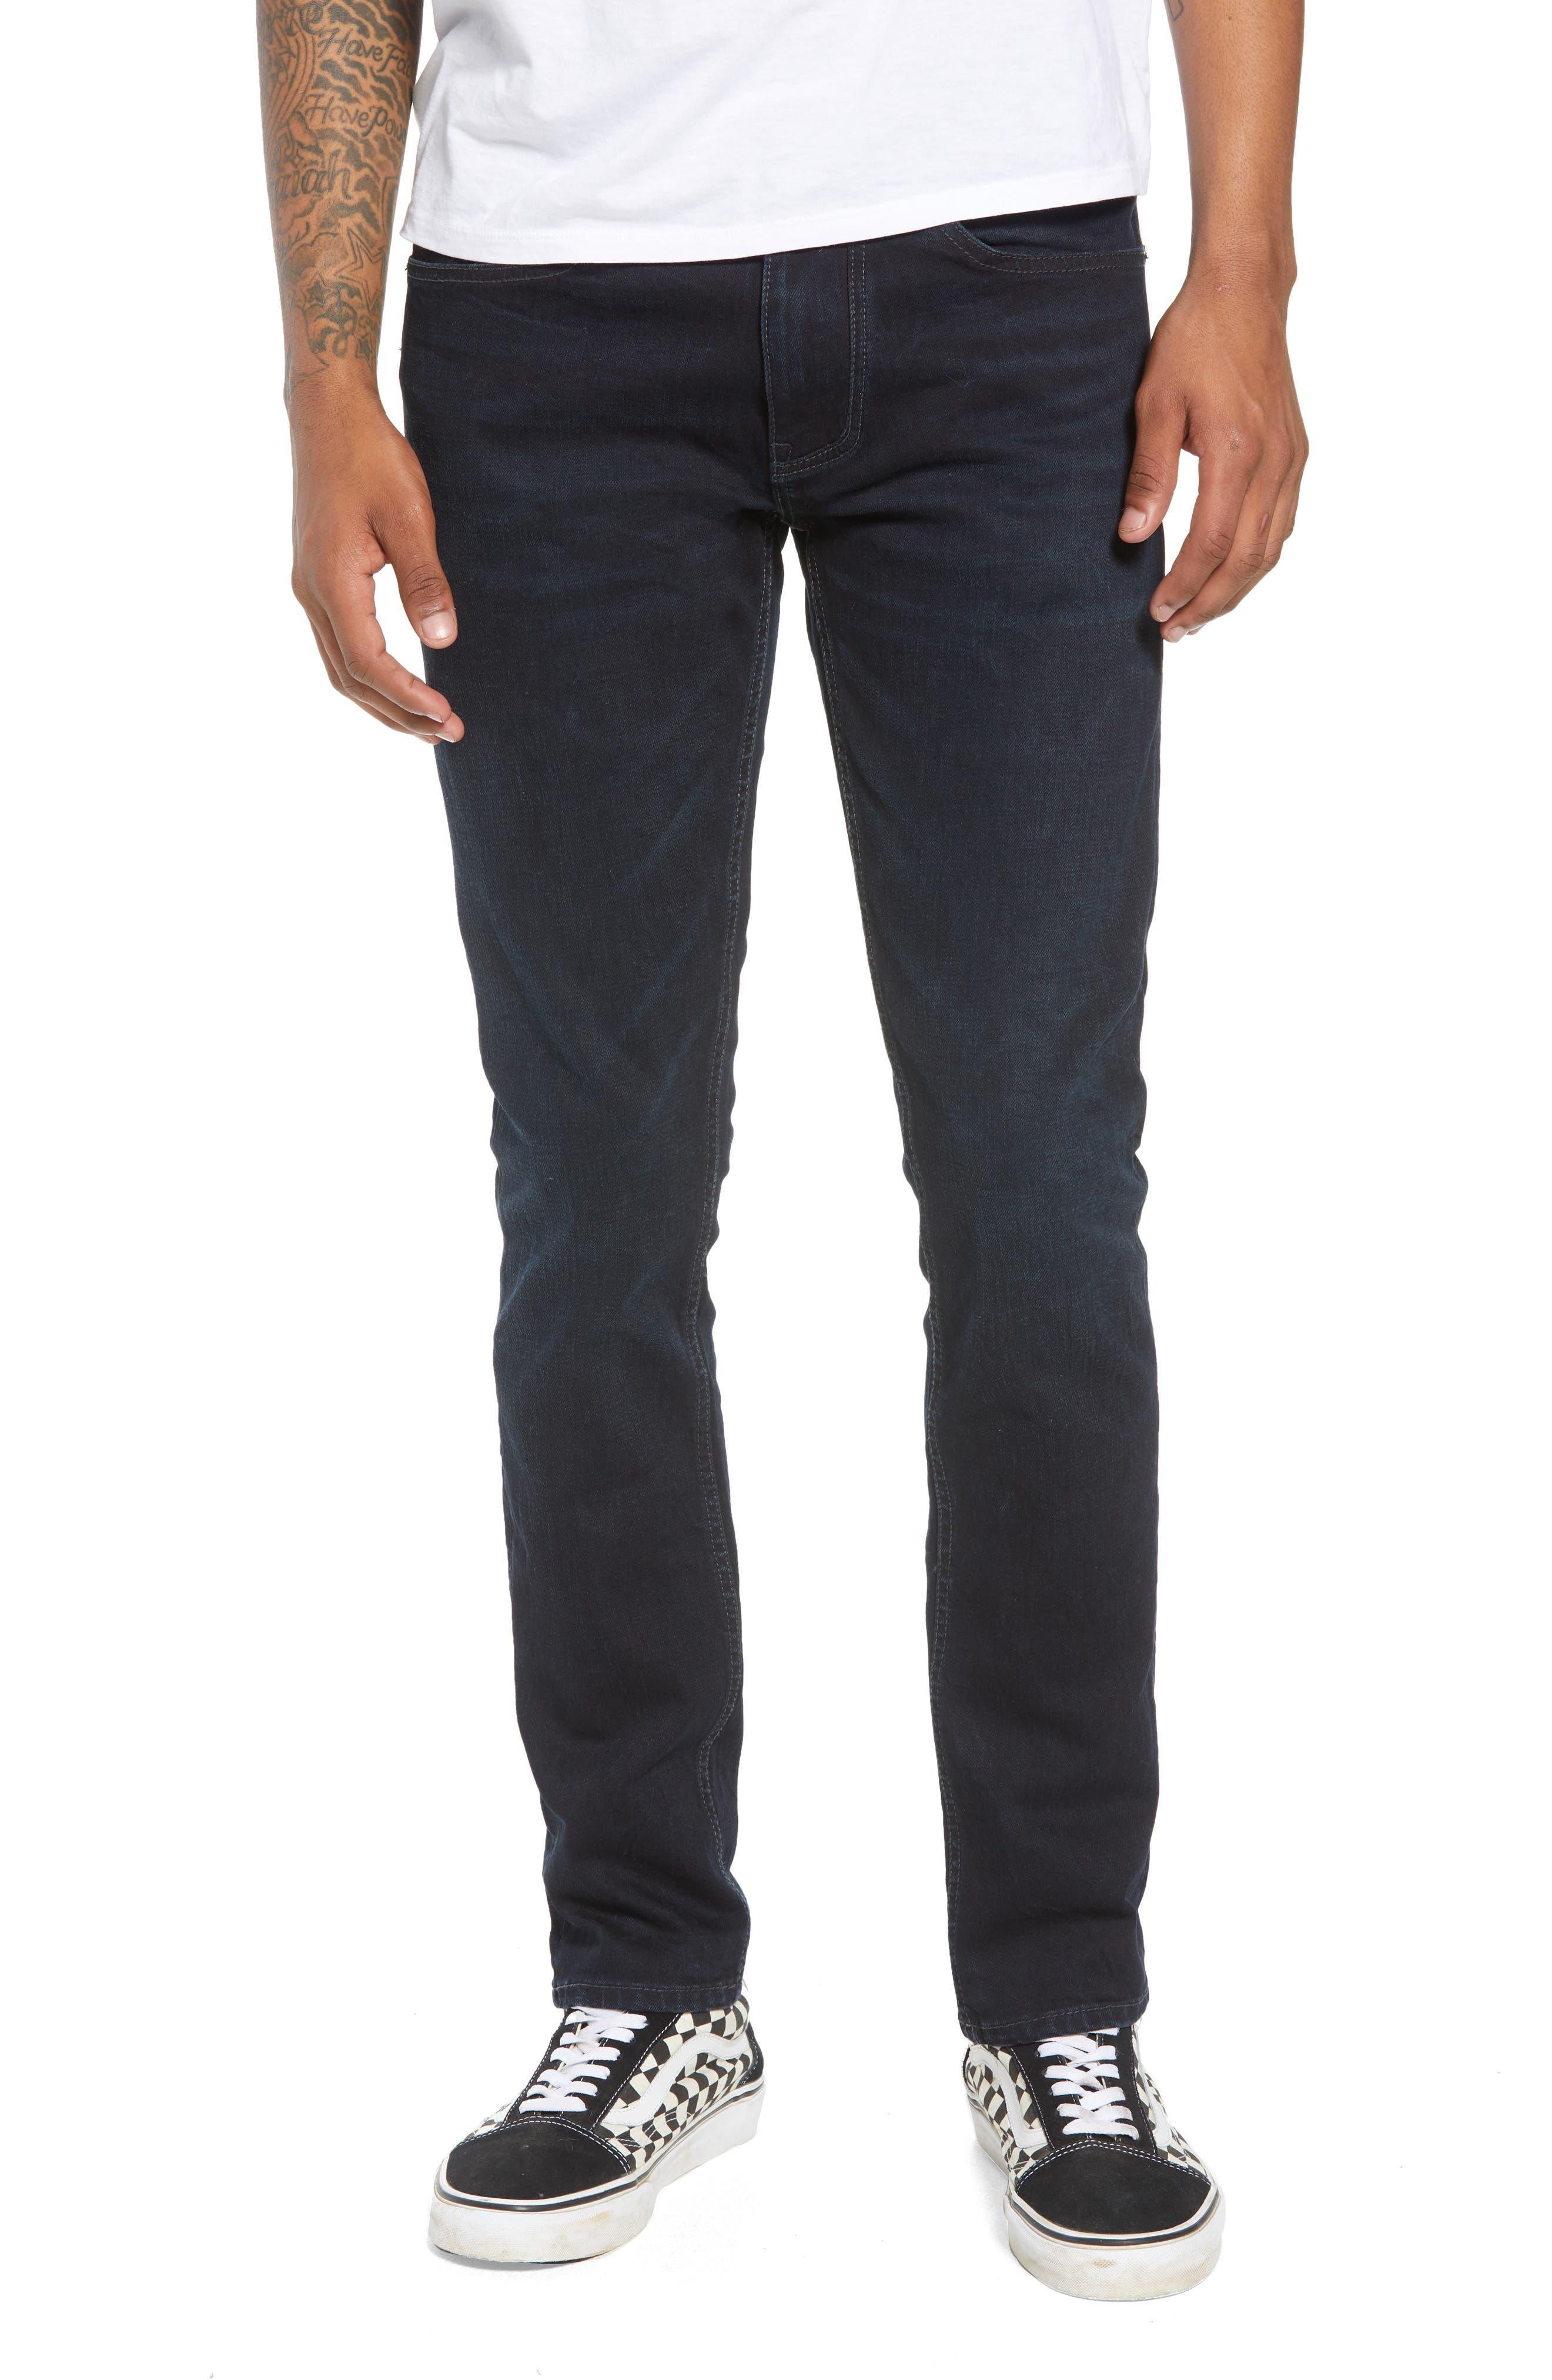 BLANKNYC Wooster Slim Fit Jeans (Company Alarm)